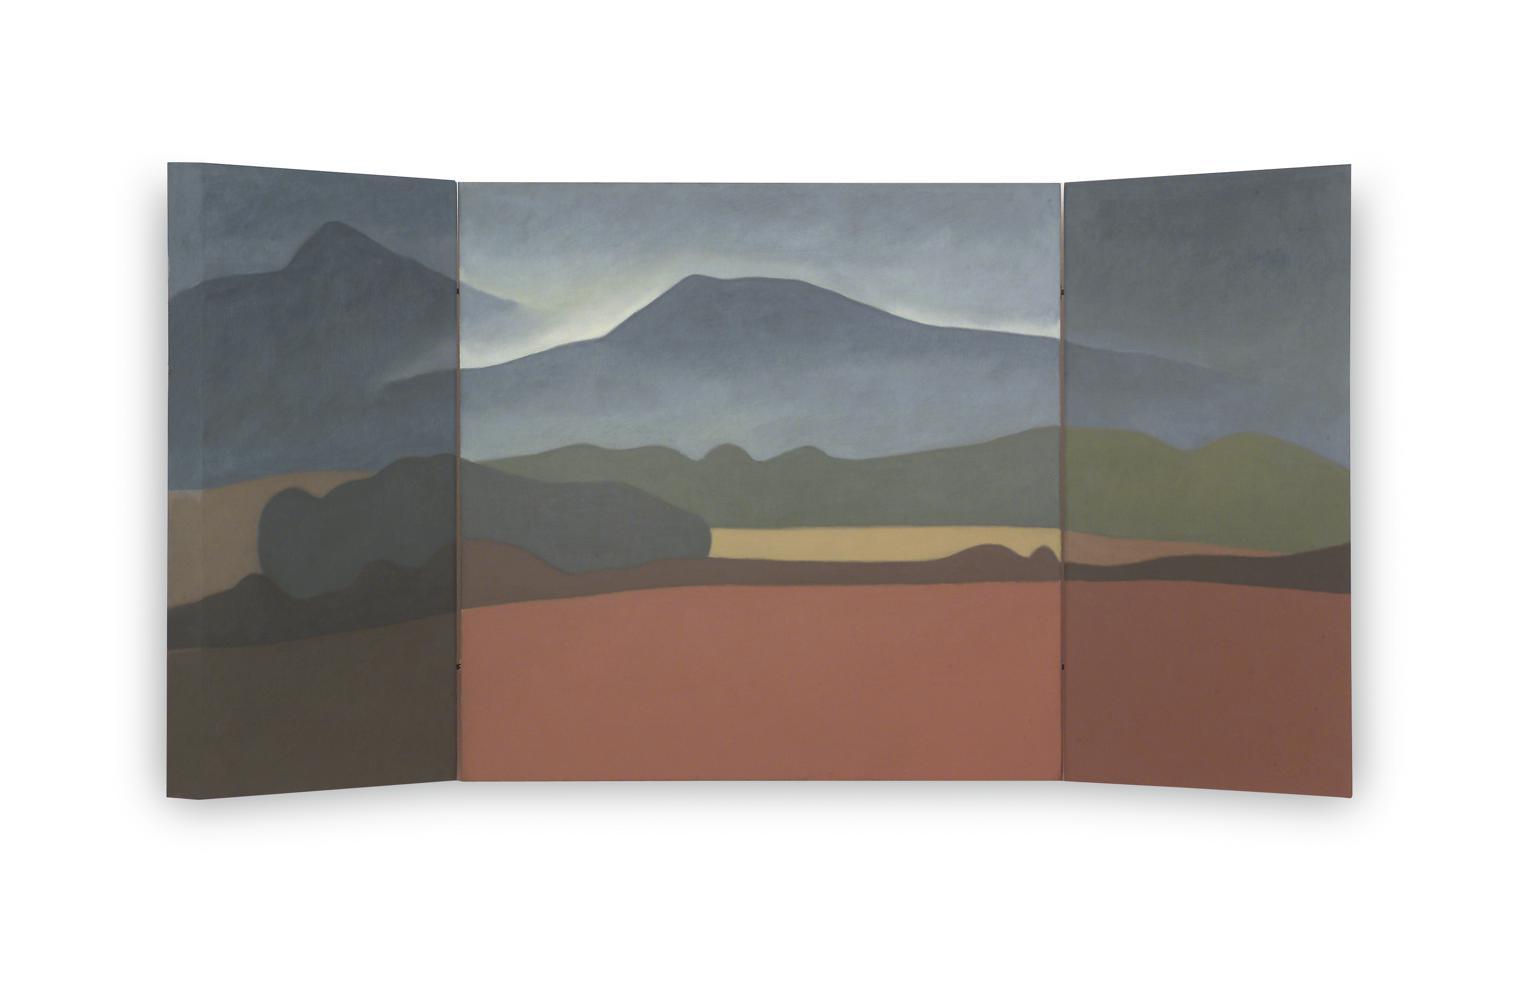 Tierra Estella (Tríptico), 40 x 80 cm, óleo sobre madera, 2003.